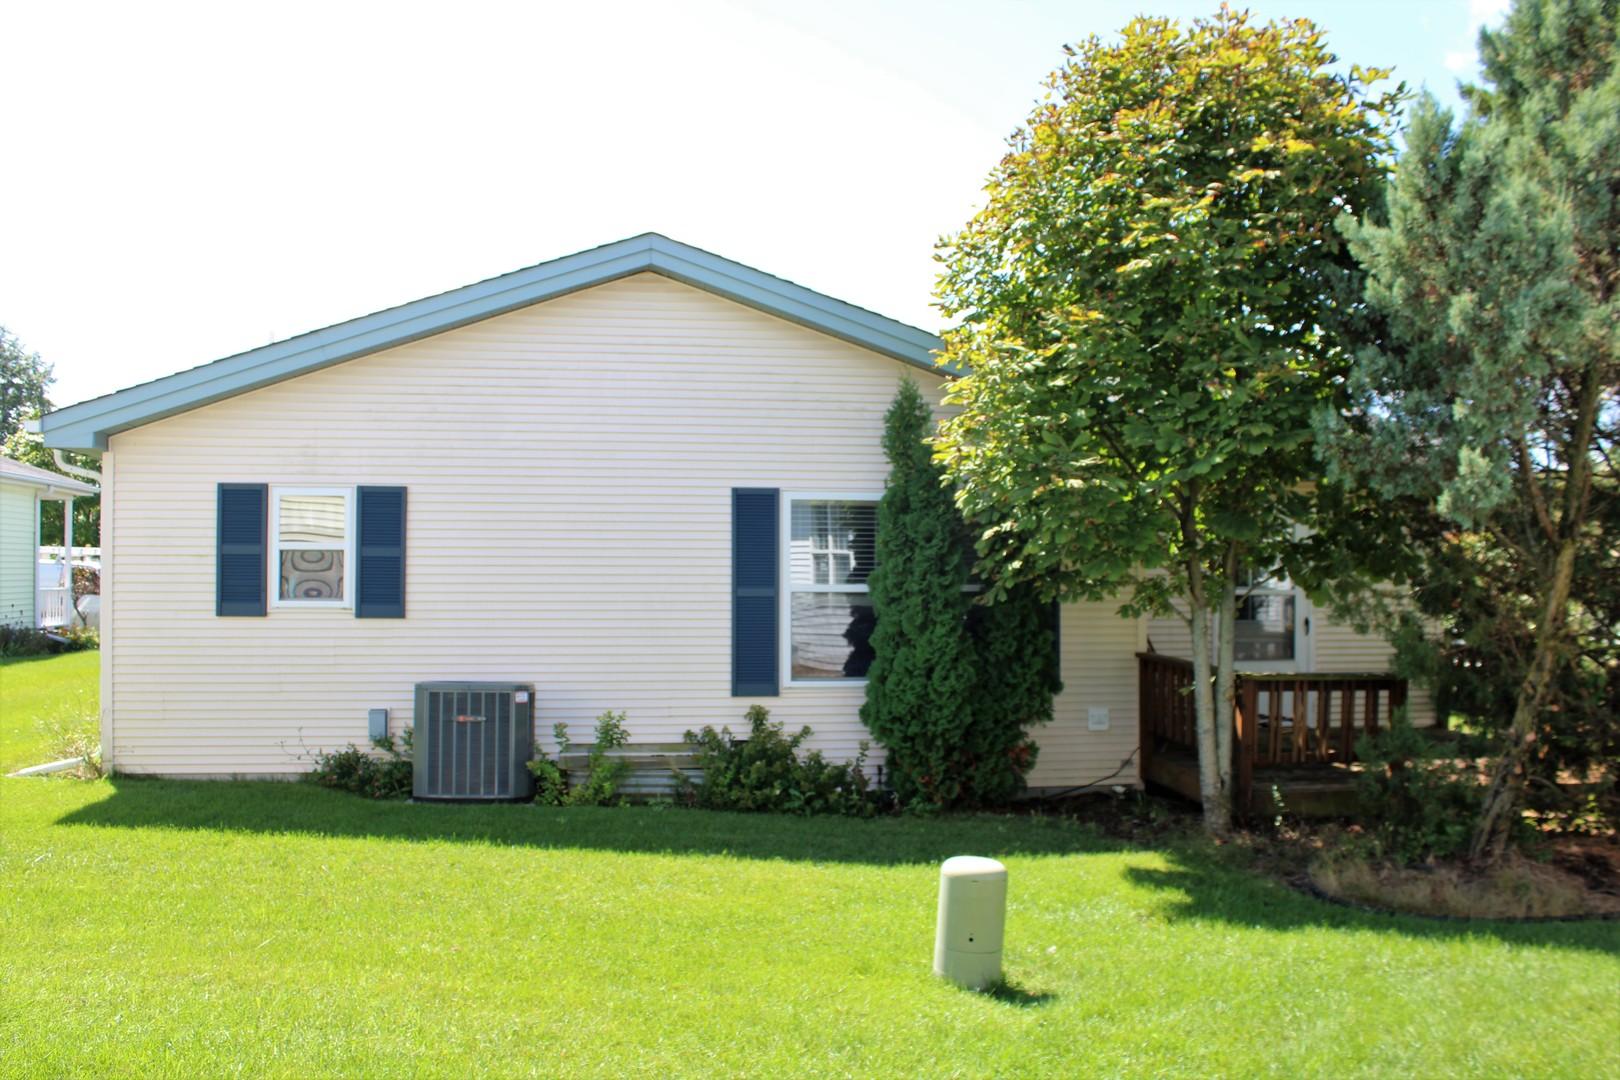 6 Furlong, Grayslake, Illinois, 60030